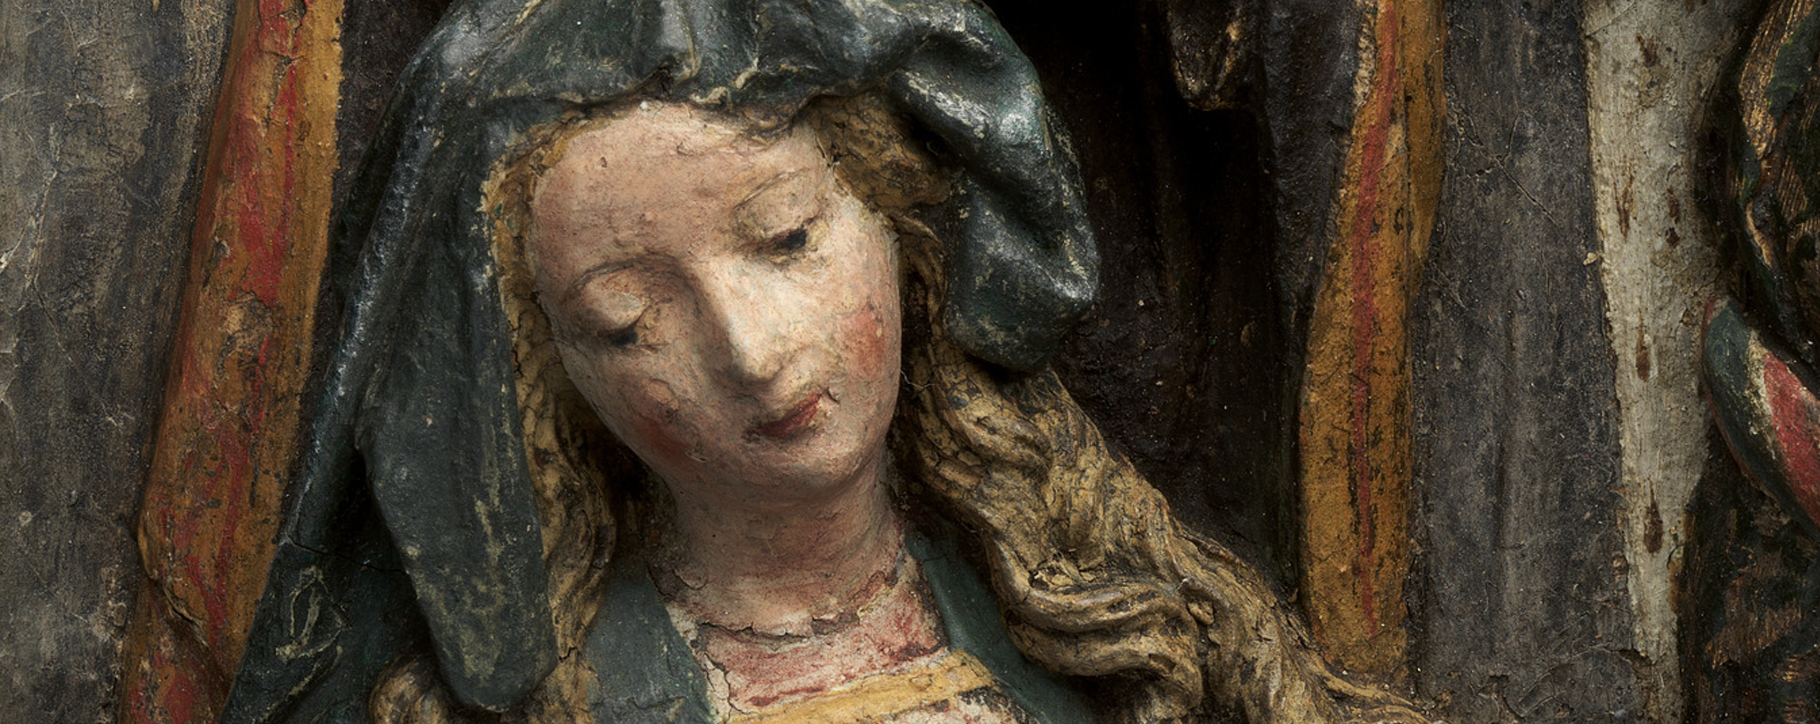 Papier Mache Virgin Mary